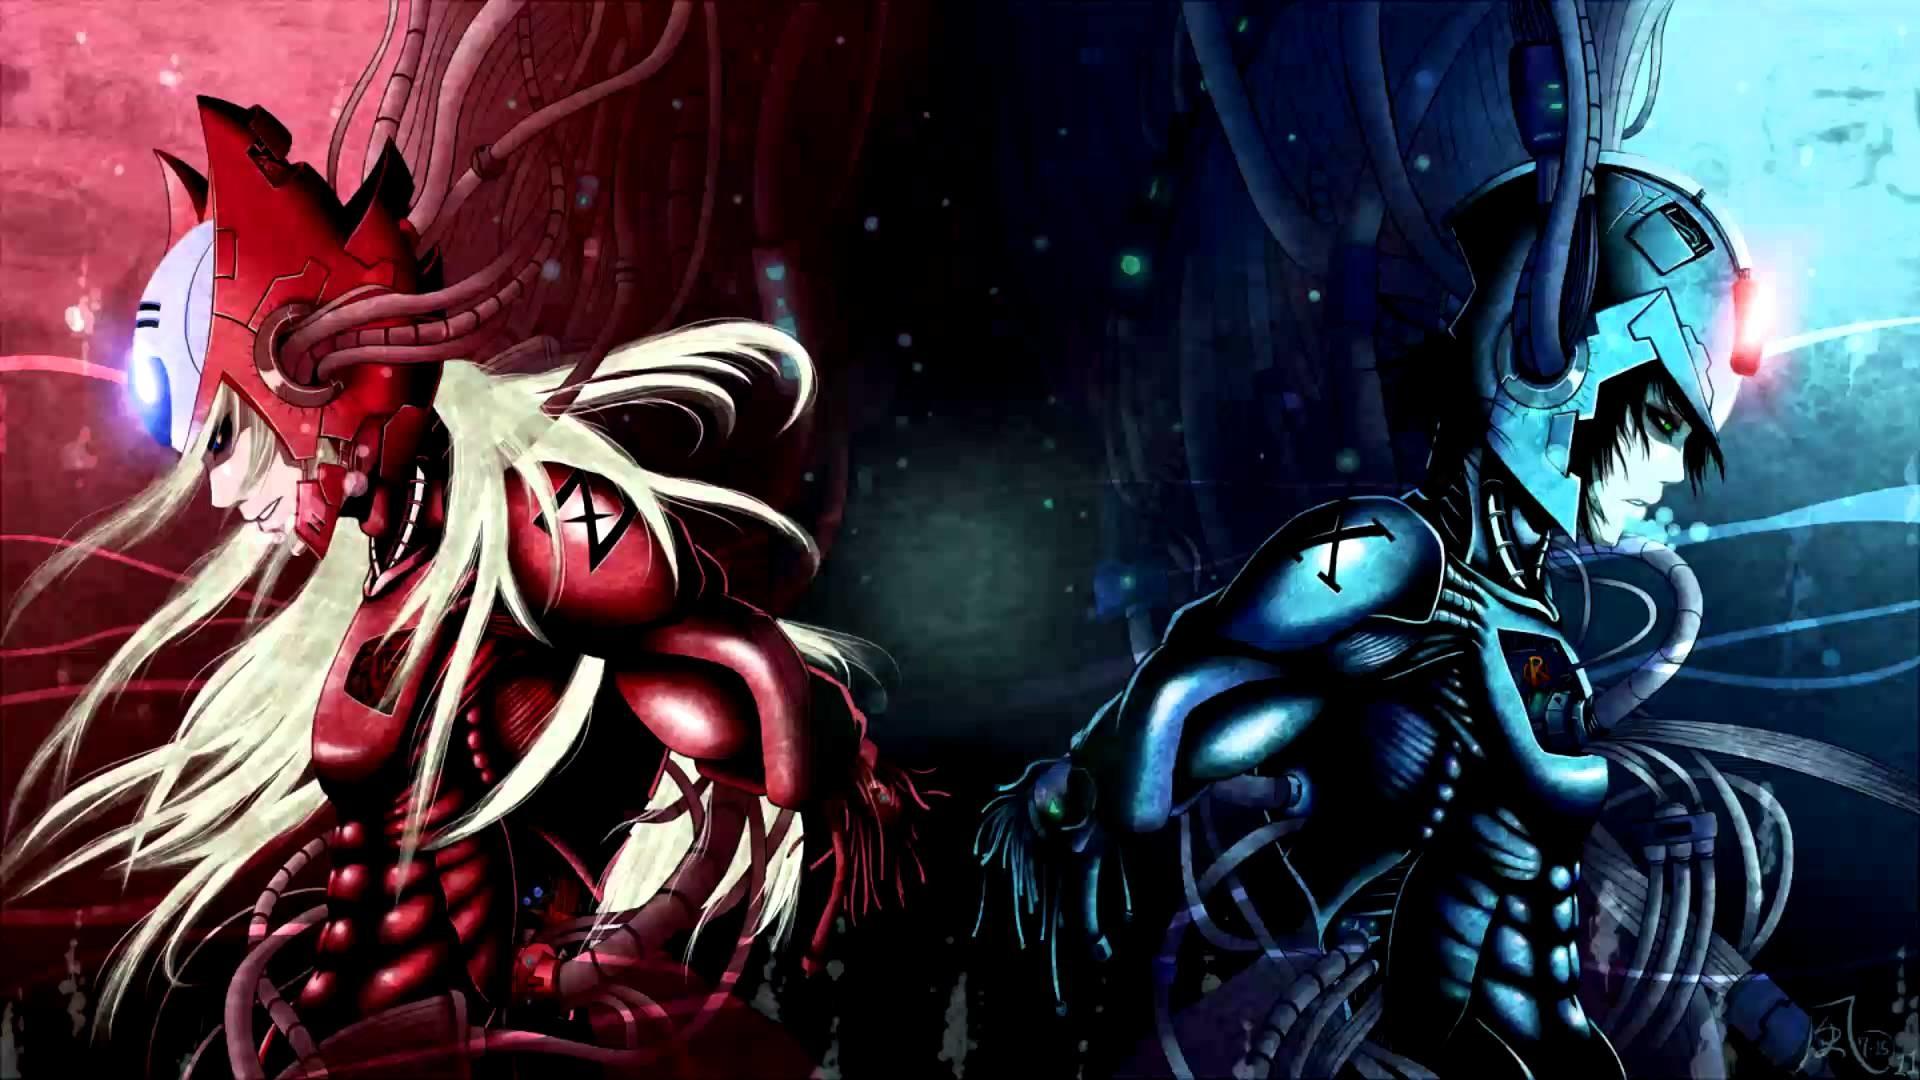 Mega Man X5 / Rockman X5 Zero Stage 2 Music Theme Extended High Quality